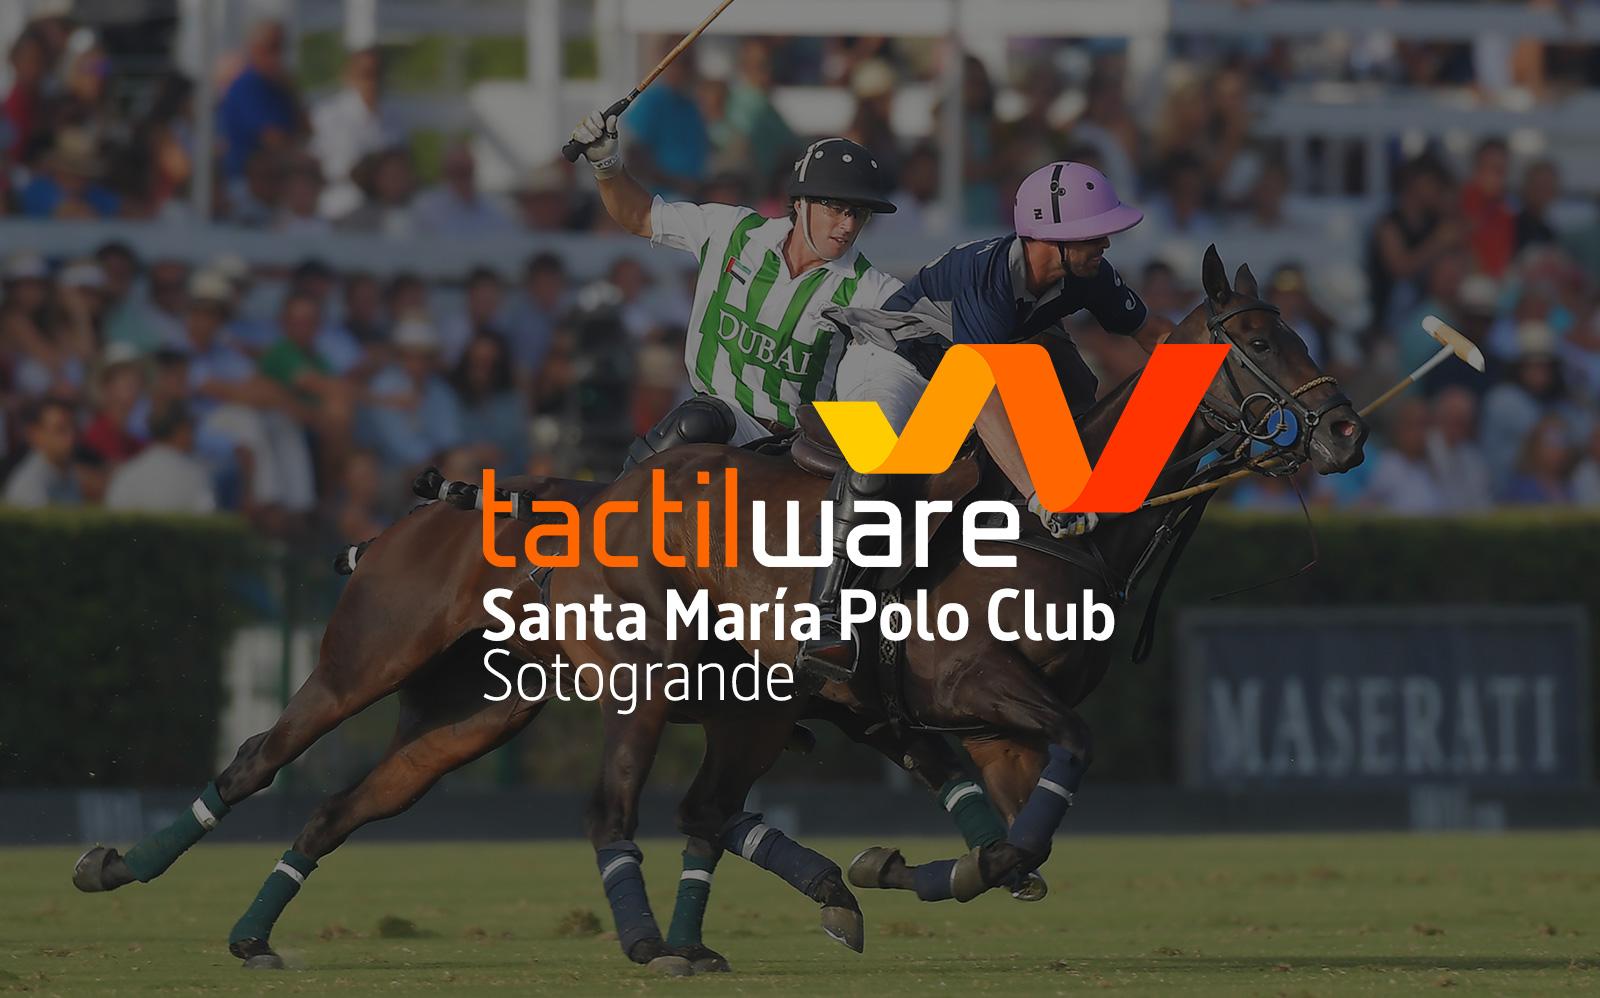 46º Torneo Internacional de Polo en Santa María Polo Club de Sotogrande